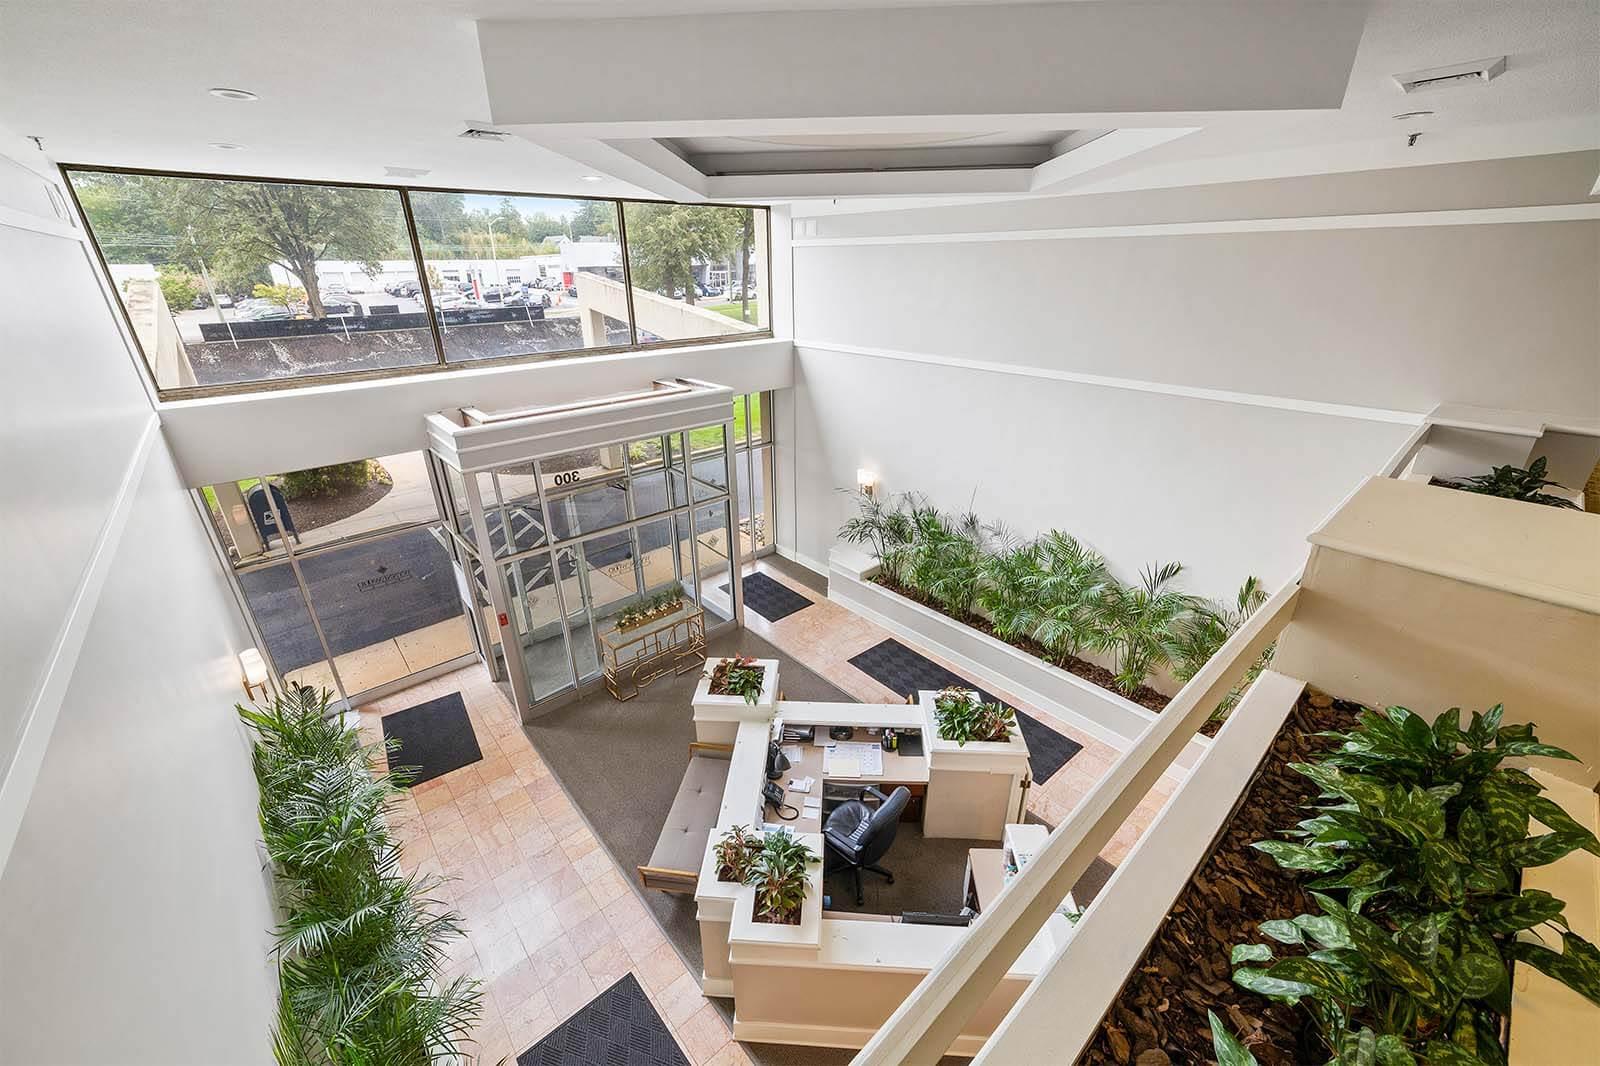 Wynnewood-House-interior-lobby-mezzanine-commercial-apartments